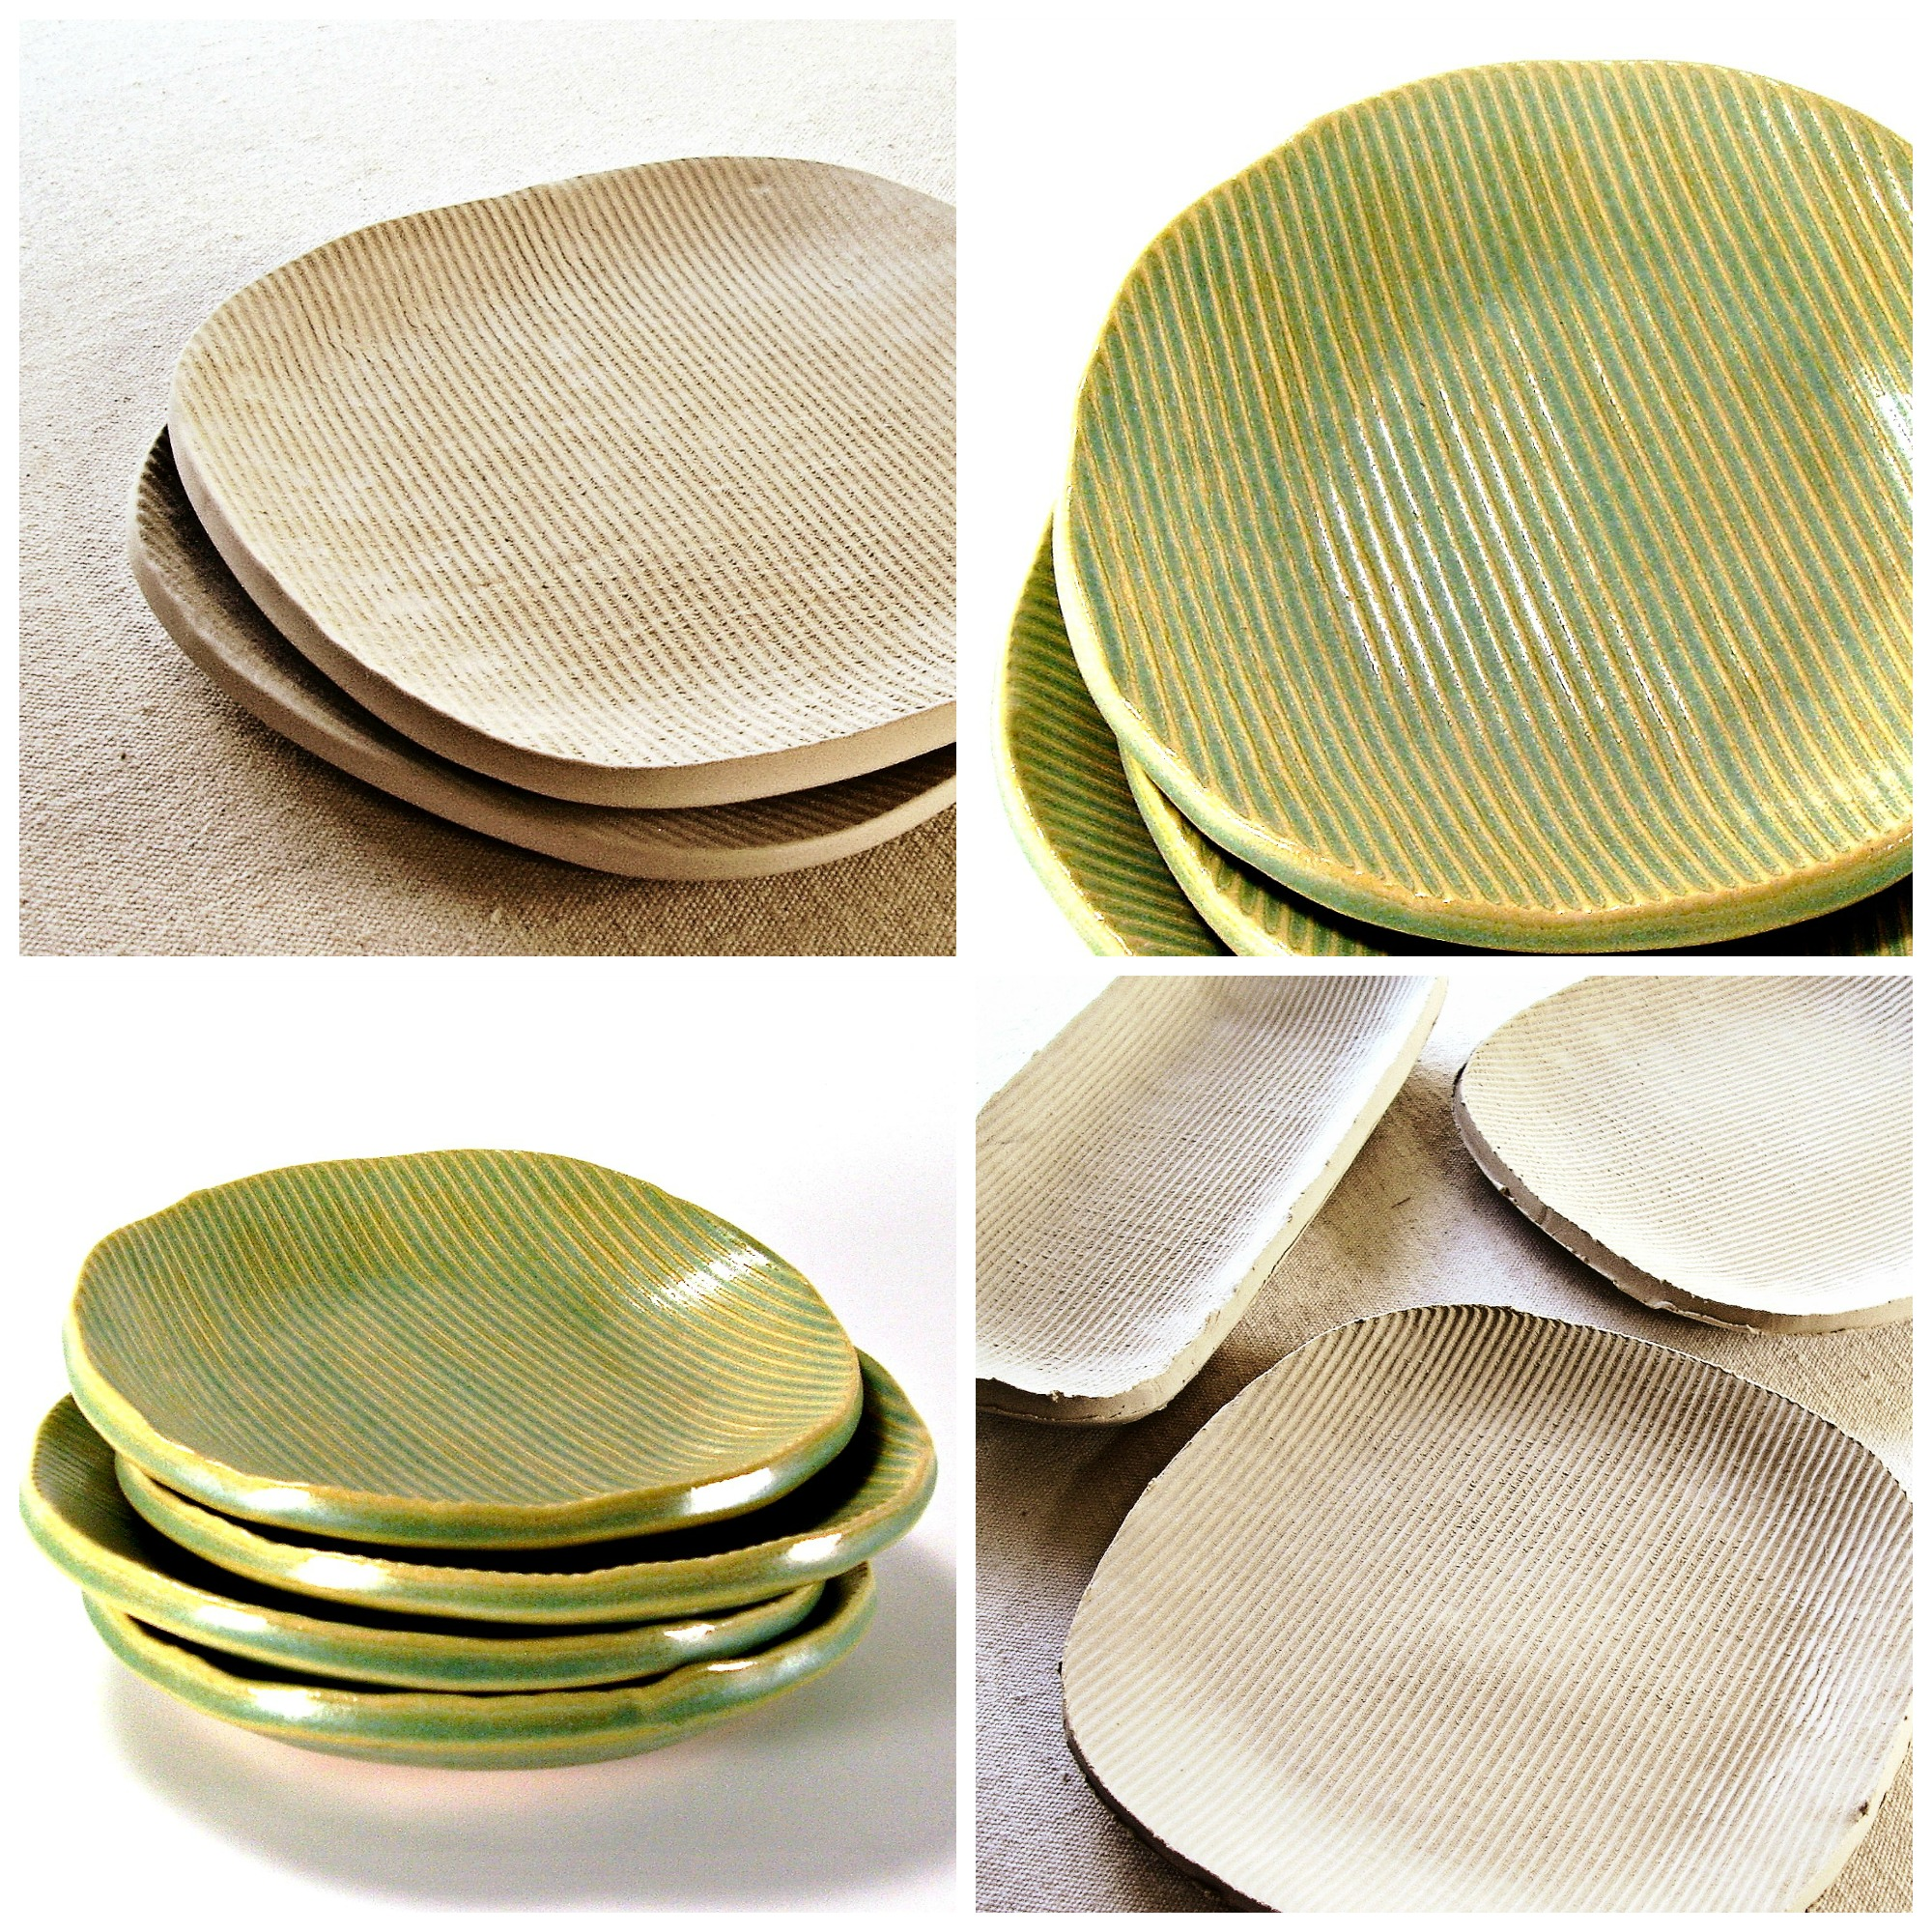 ceramic plates in progress tropical breeze melinda marie alexander ravenhillpottery.etsy.comjpg